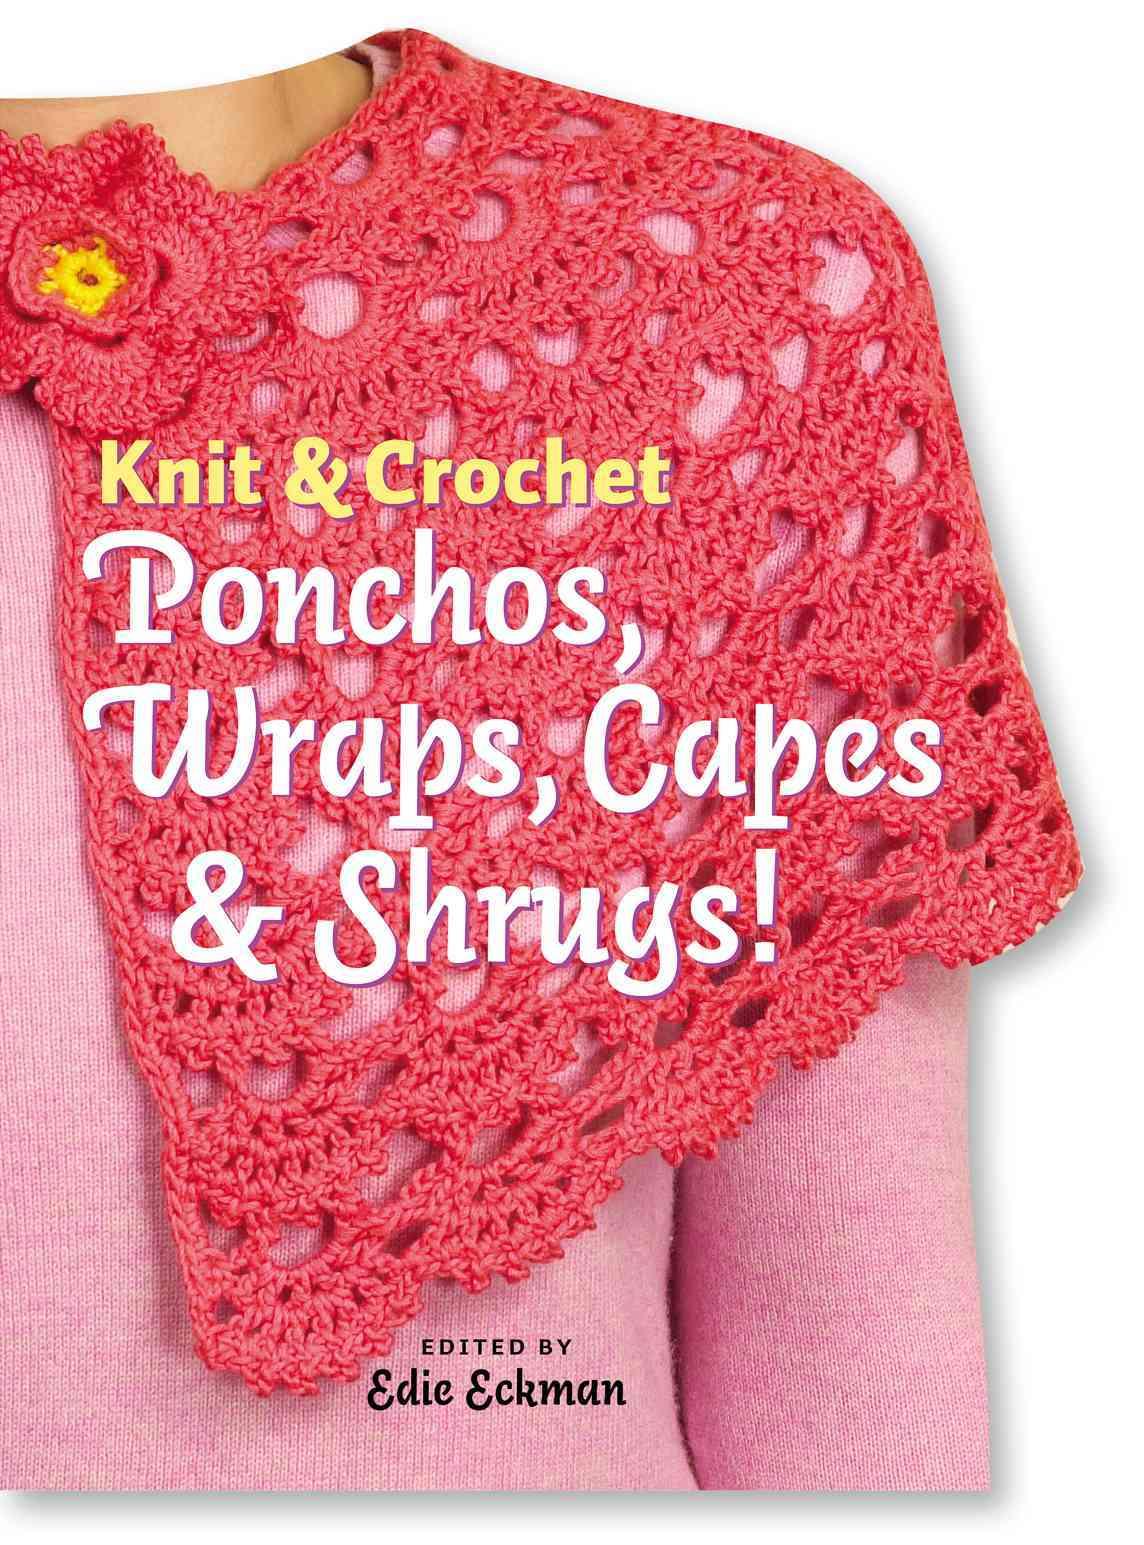 Knit & Crochet Ponchos, Wraps, Capes & Shrugs! (Hardcover)